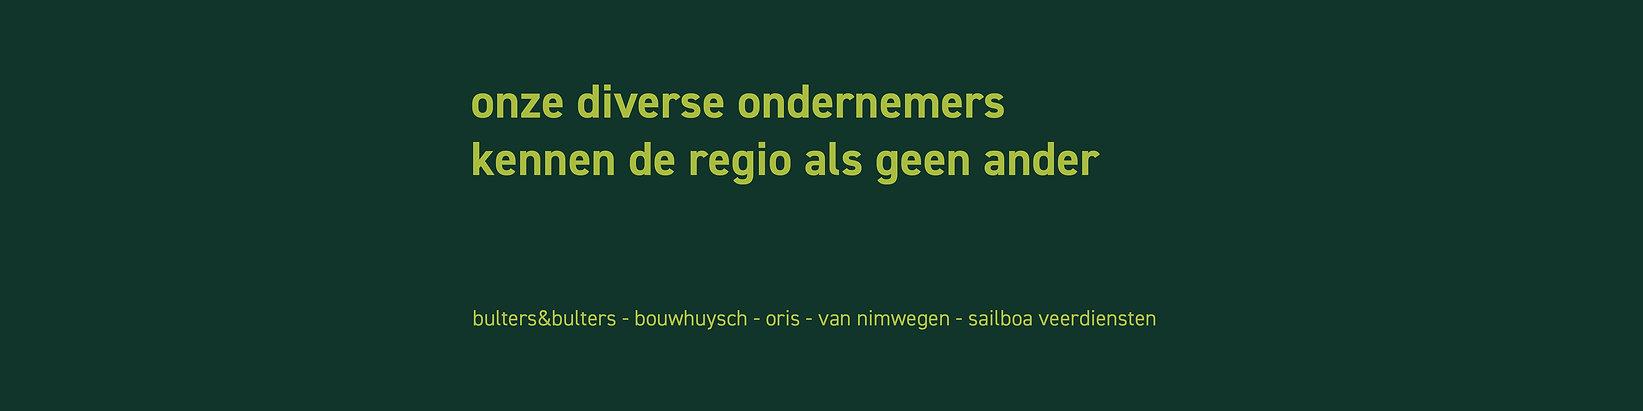 Quote slide 1.jpg